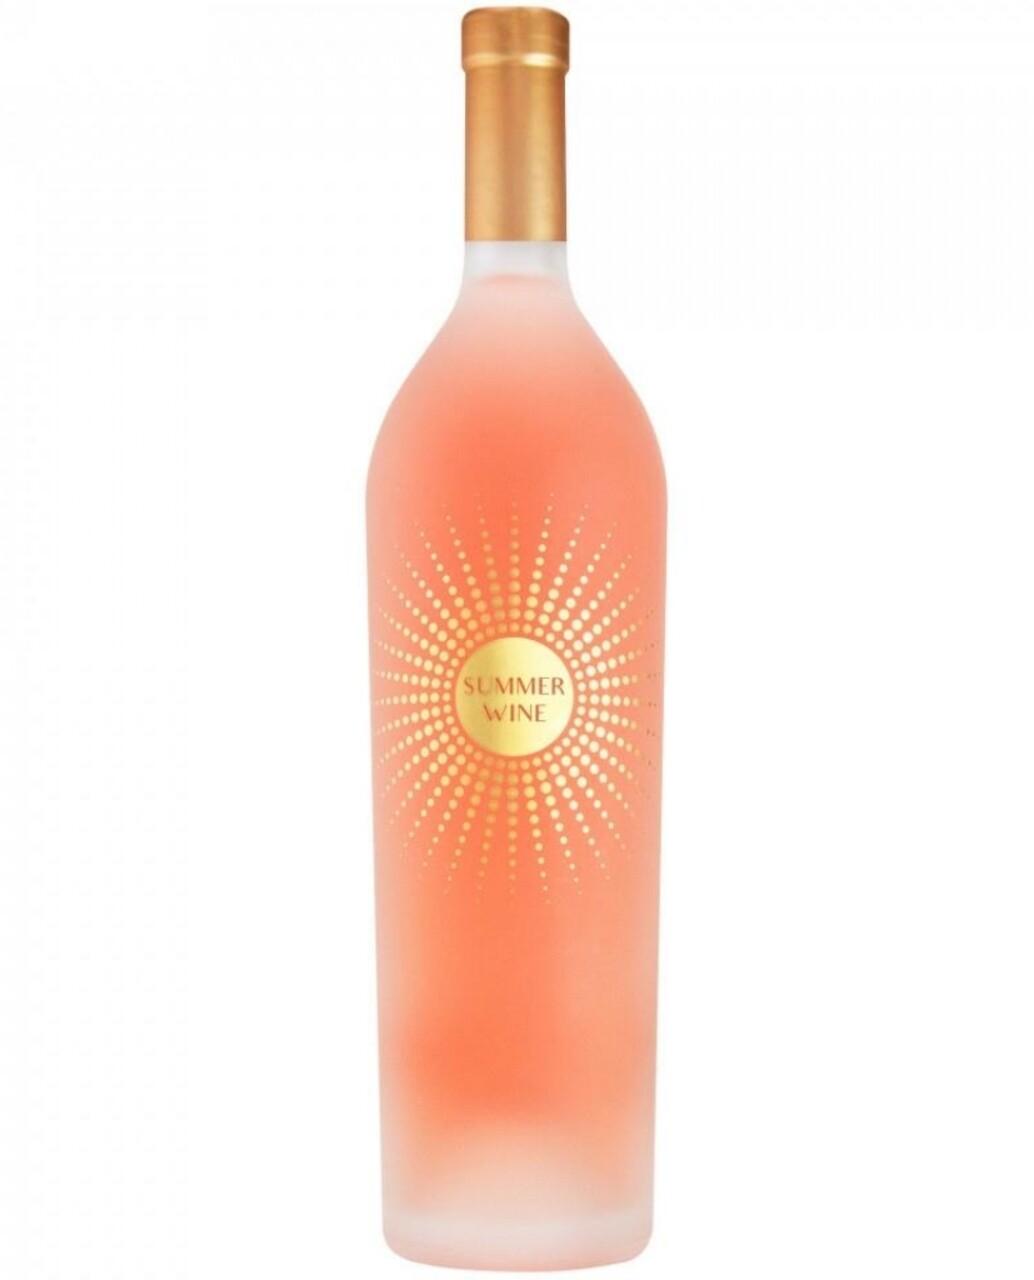 Valahorum Summer Wine Rose